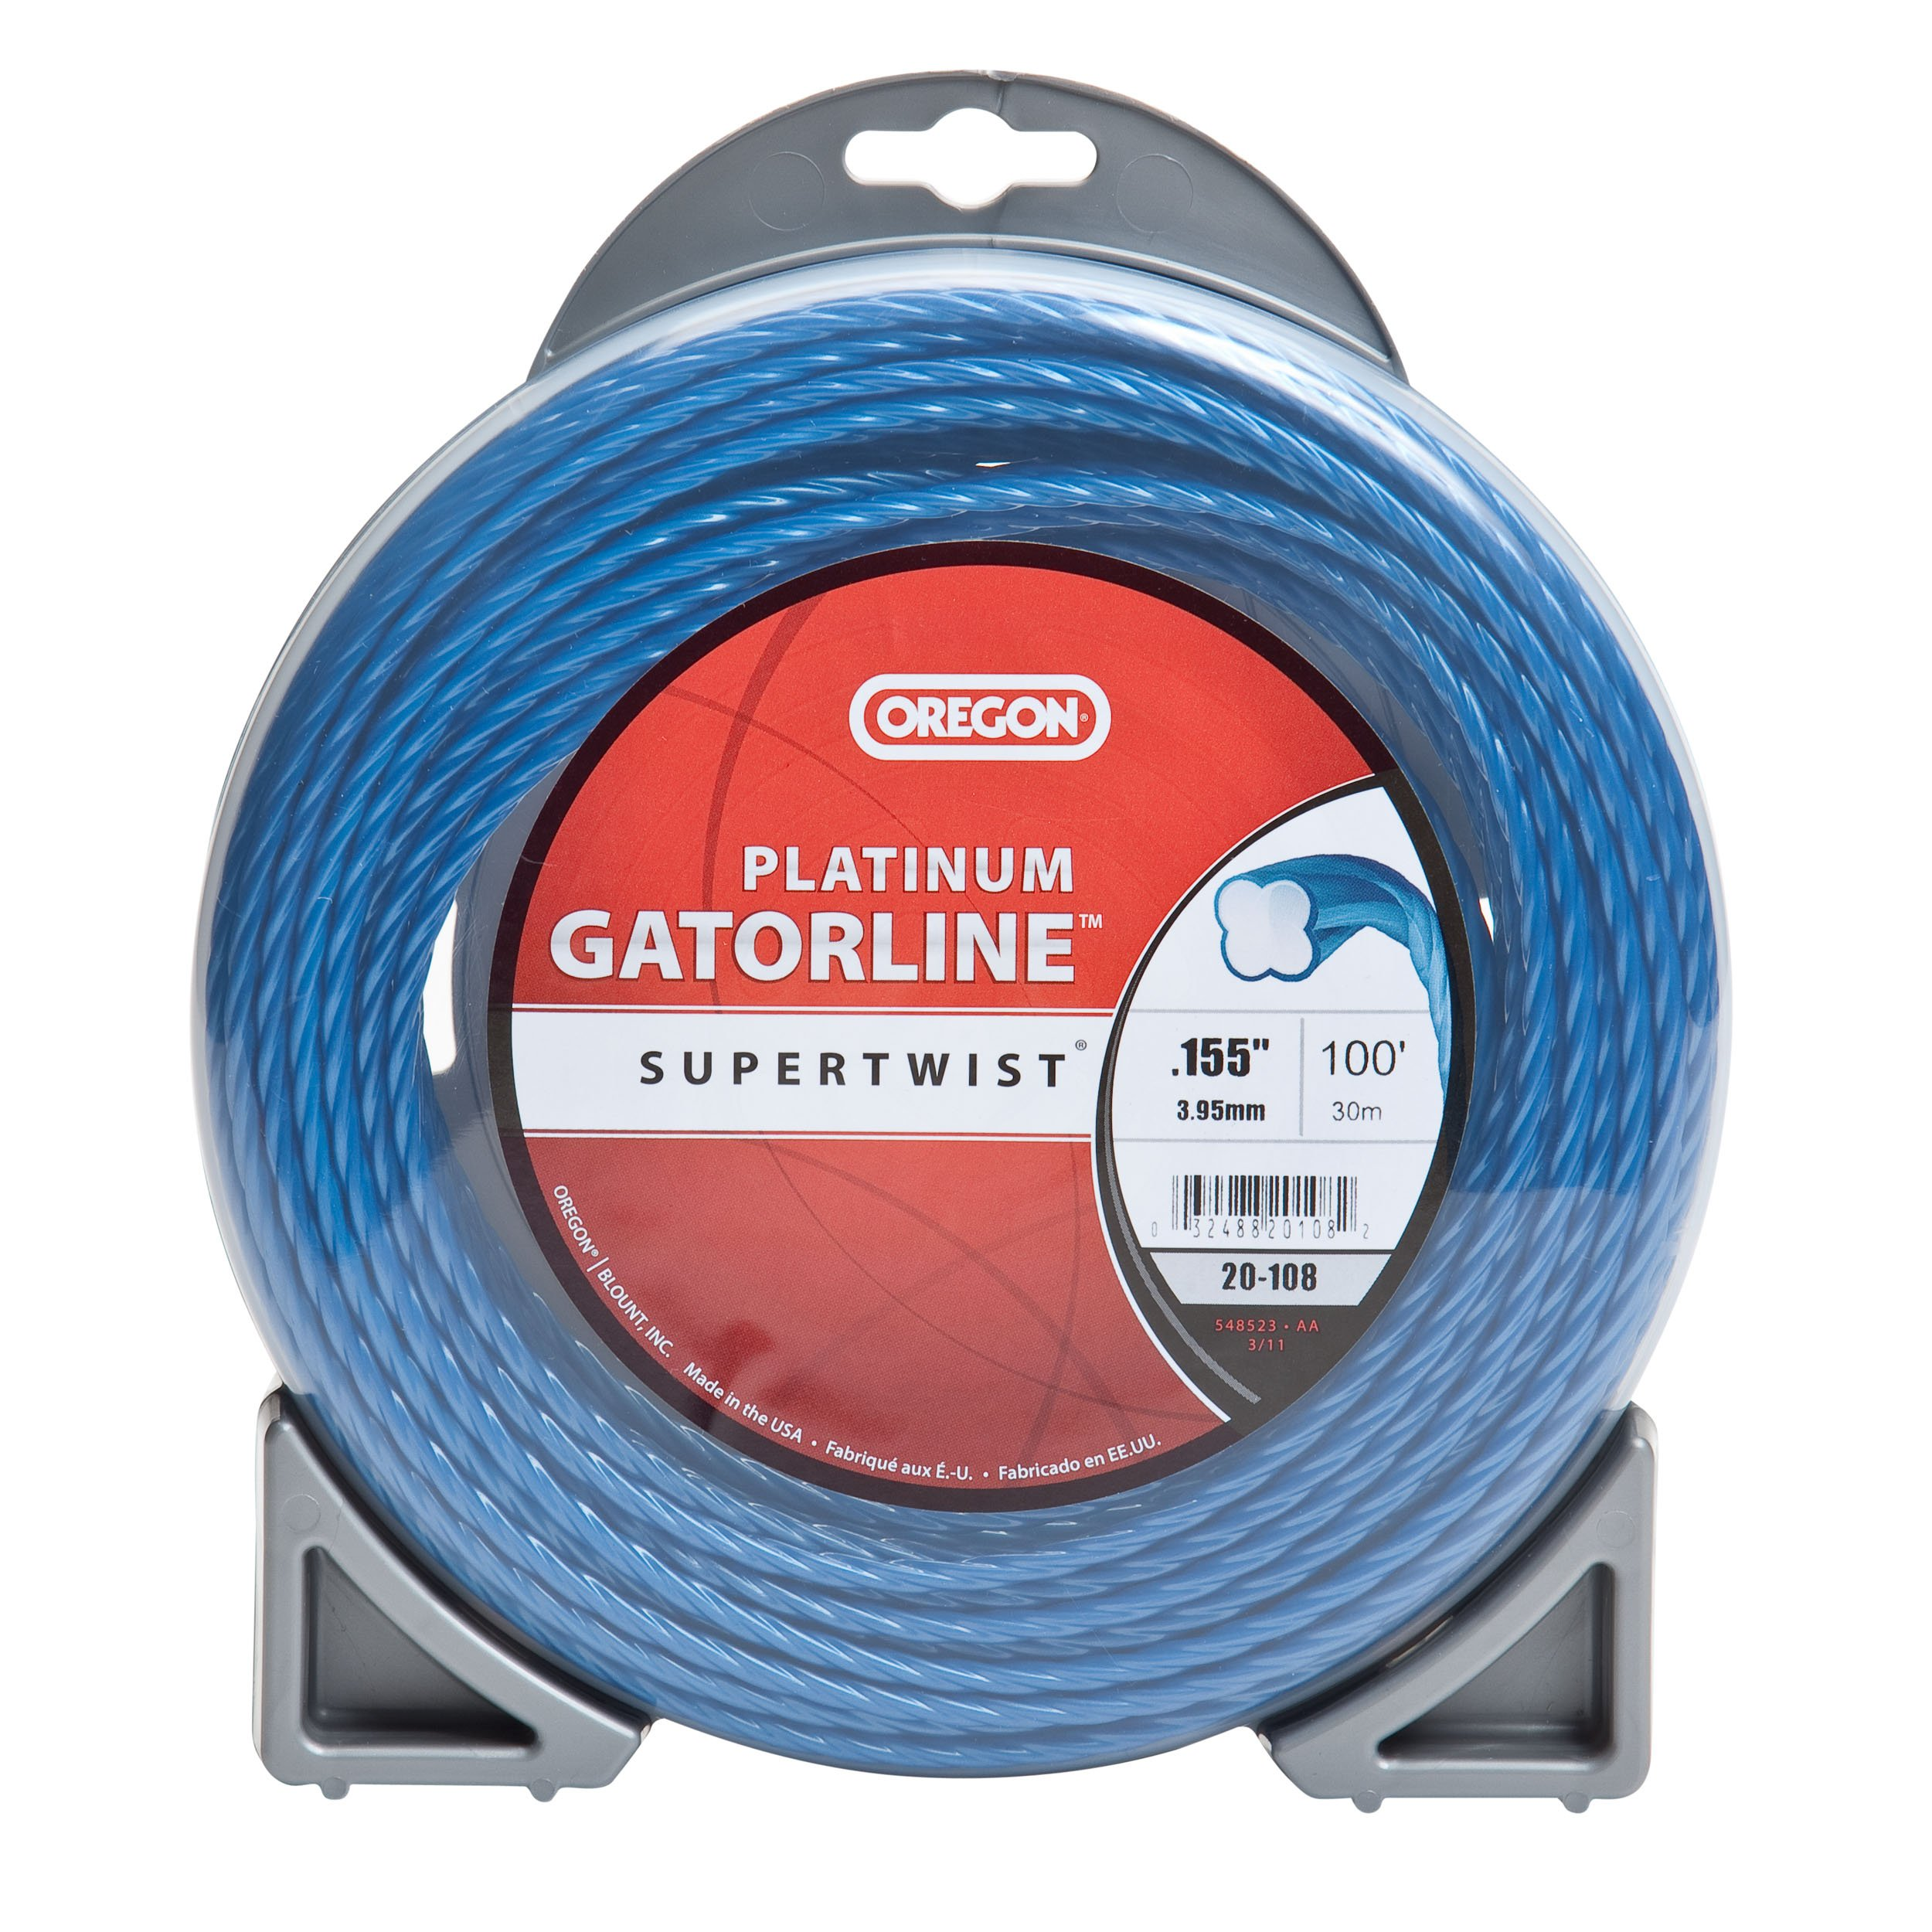 Oregon 20-108 Platinum Gatorline 1-Pound Donut String Trimmer Line 0.155-Inch Gauge by Oregon